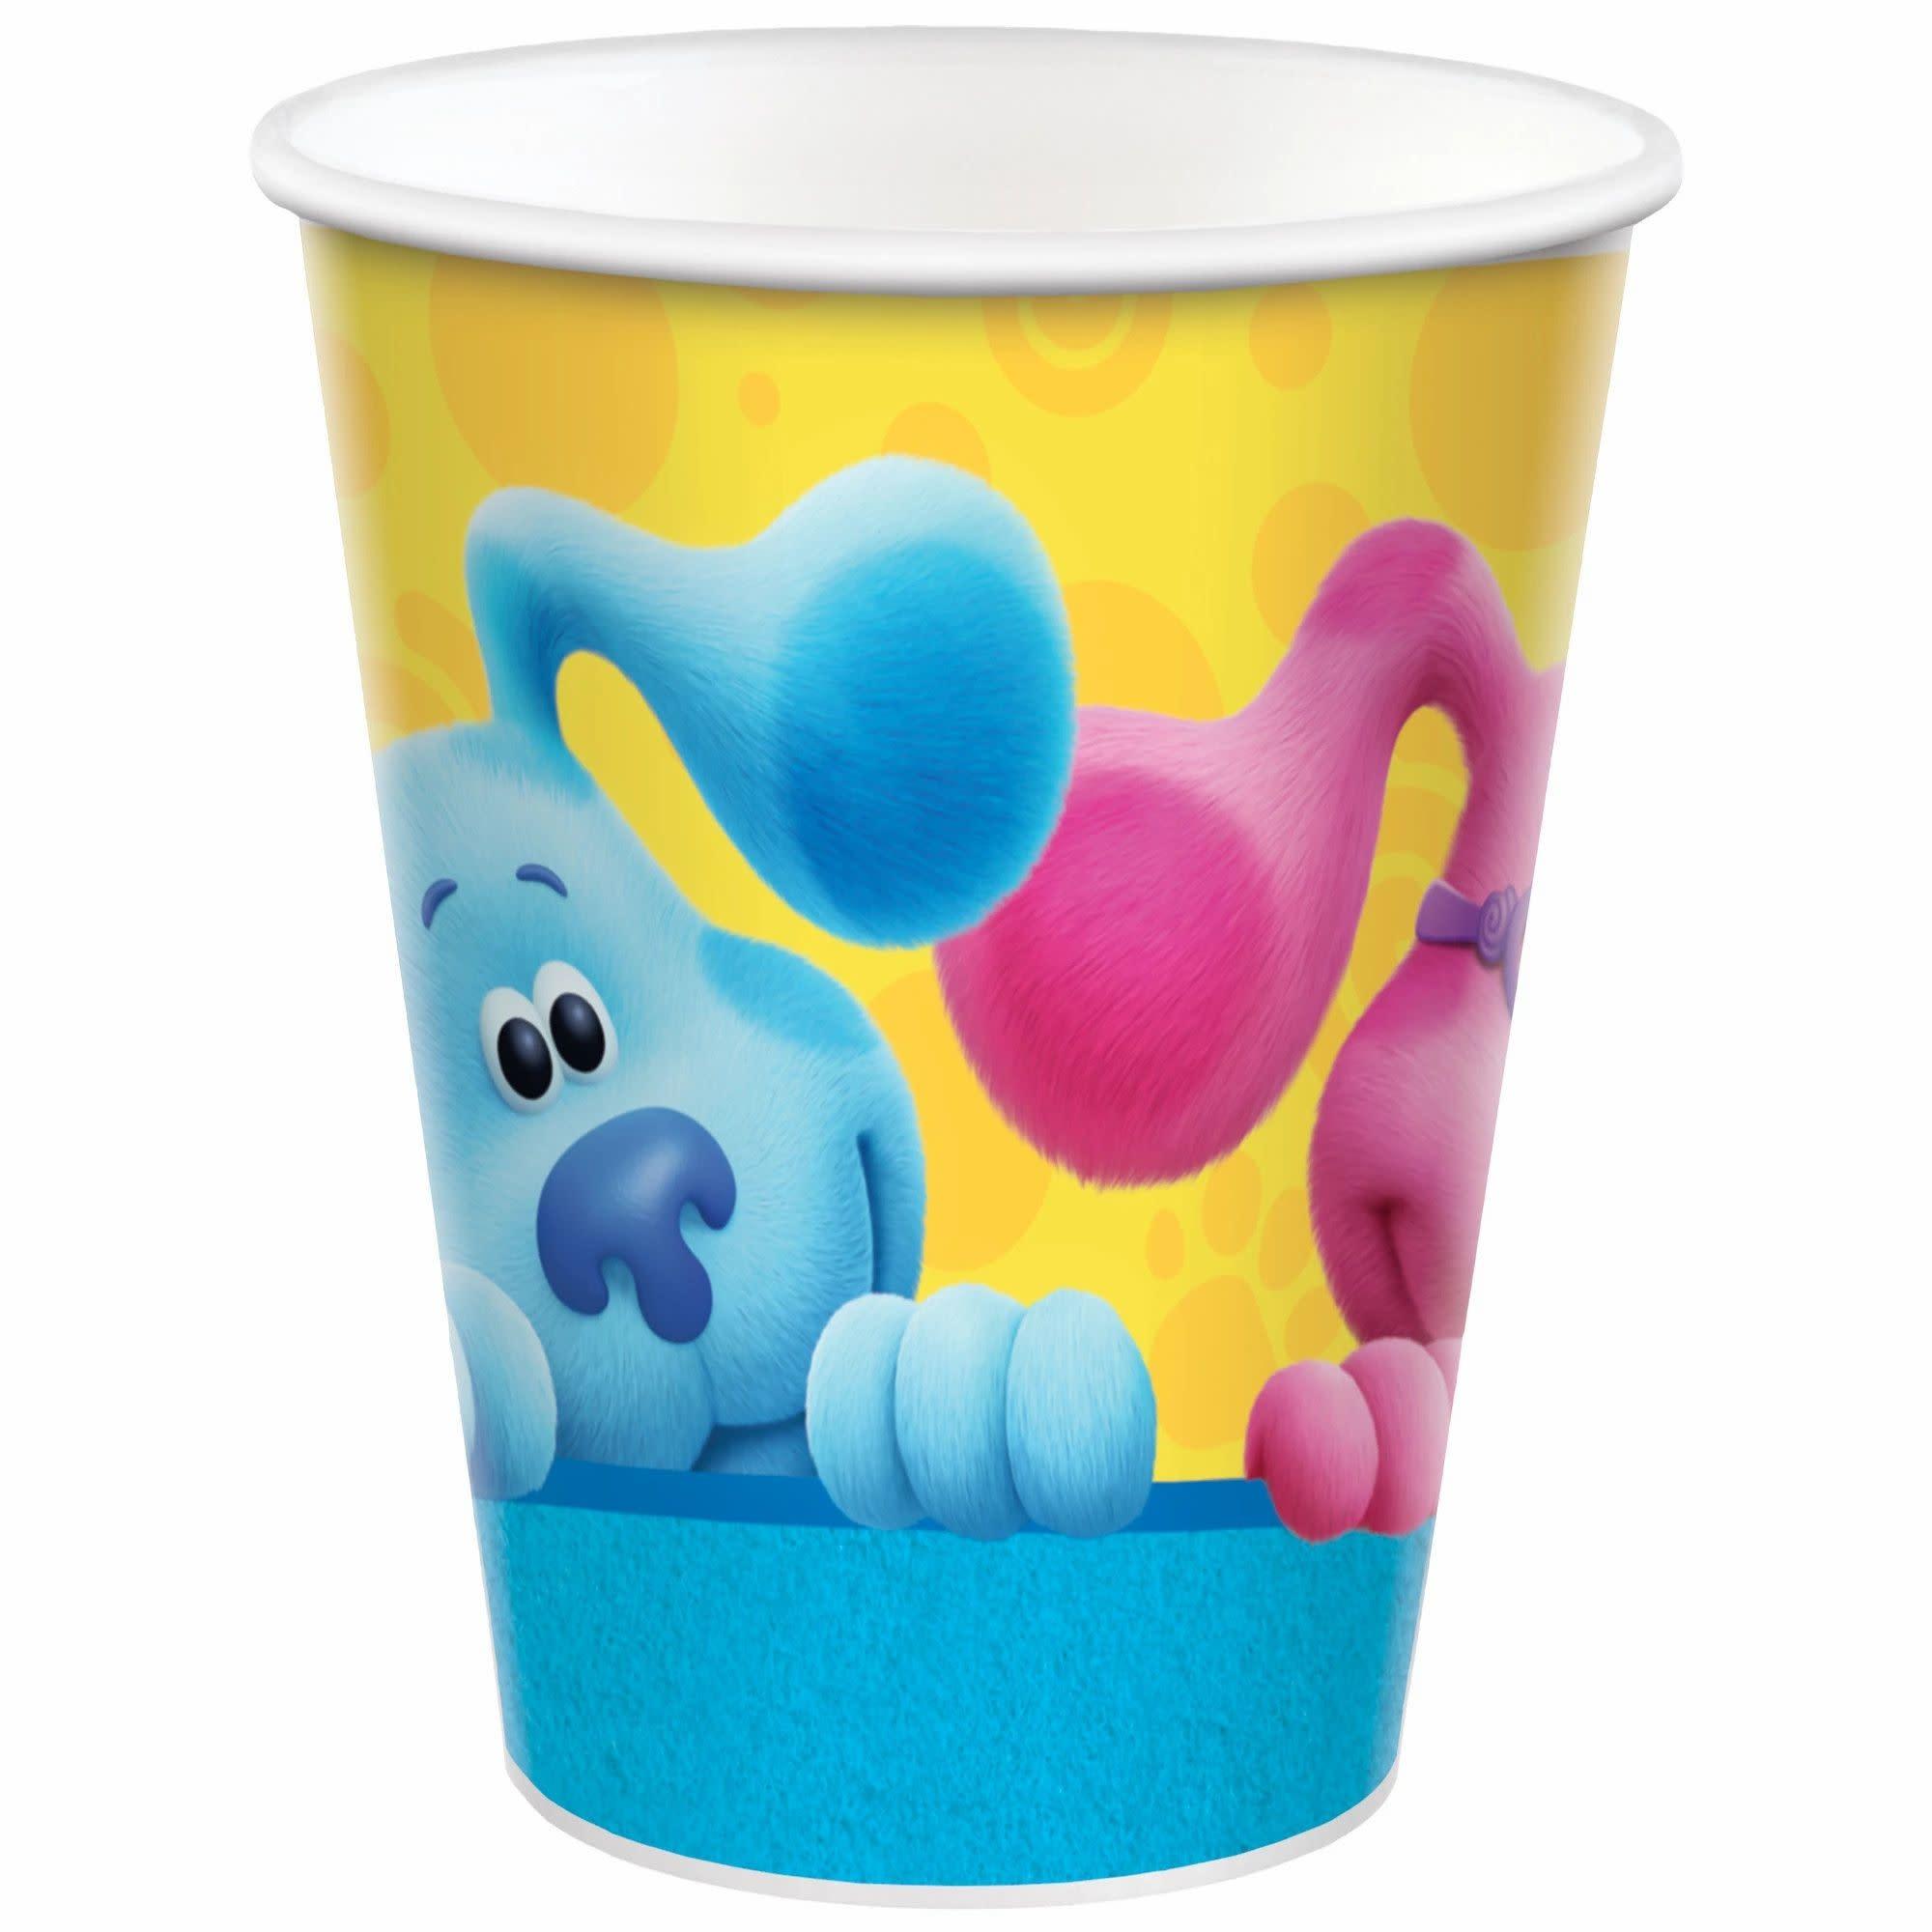 Blues Clues Cups, 9 Oz.